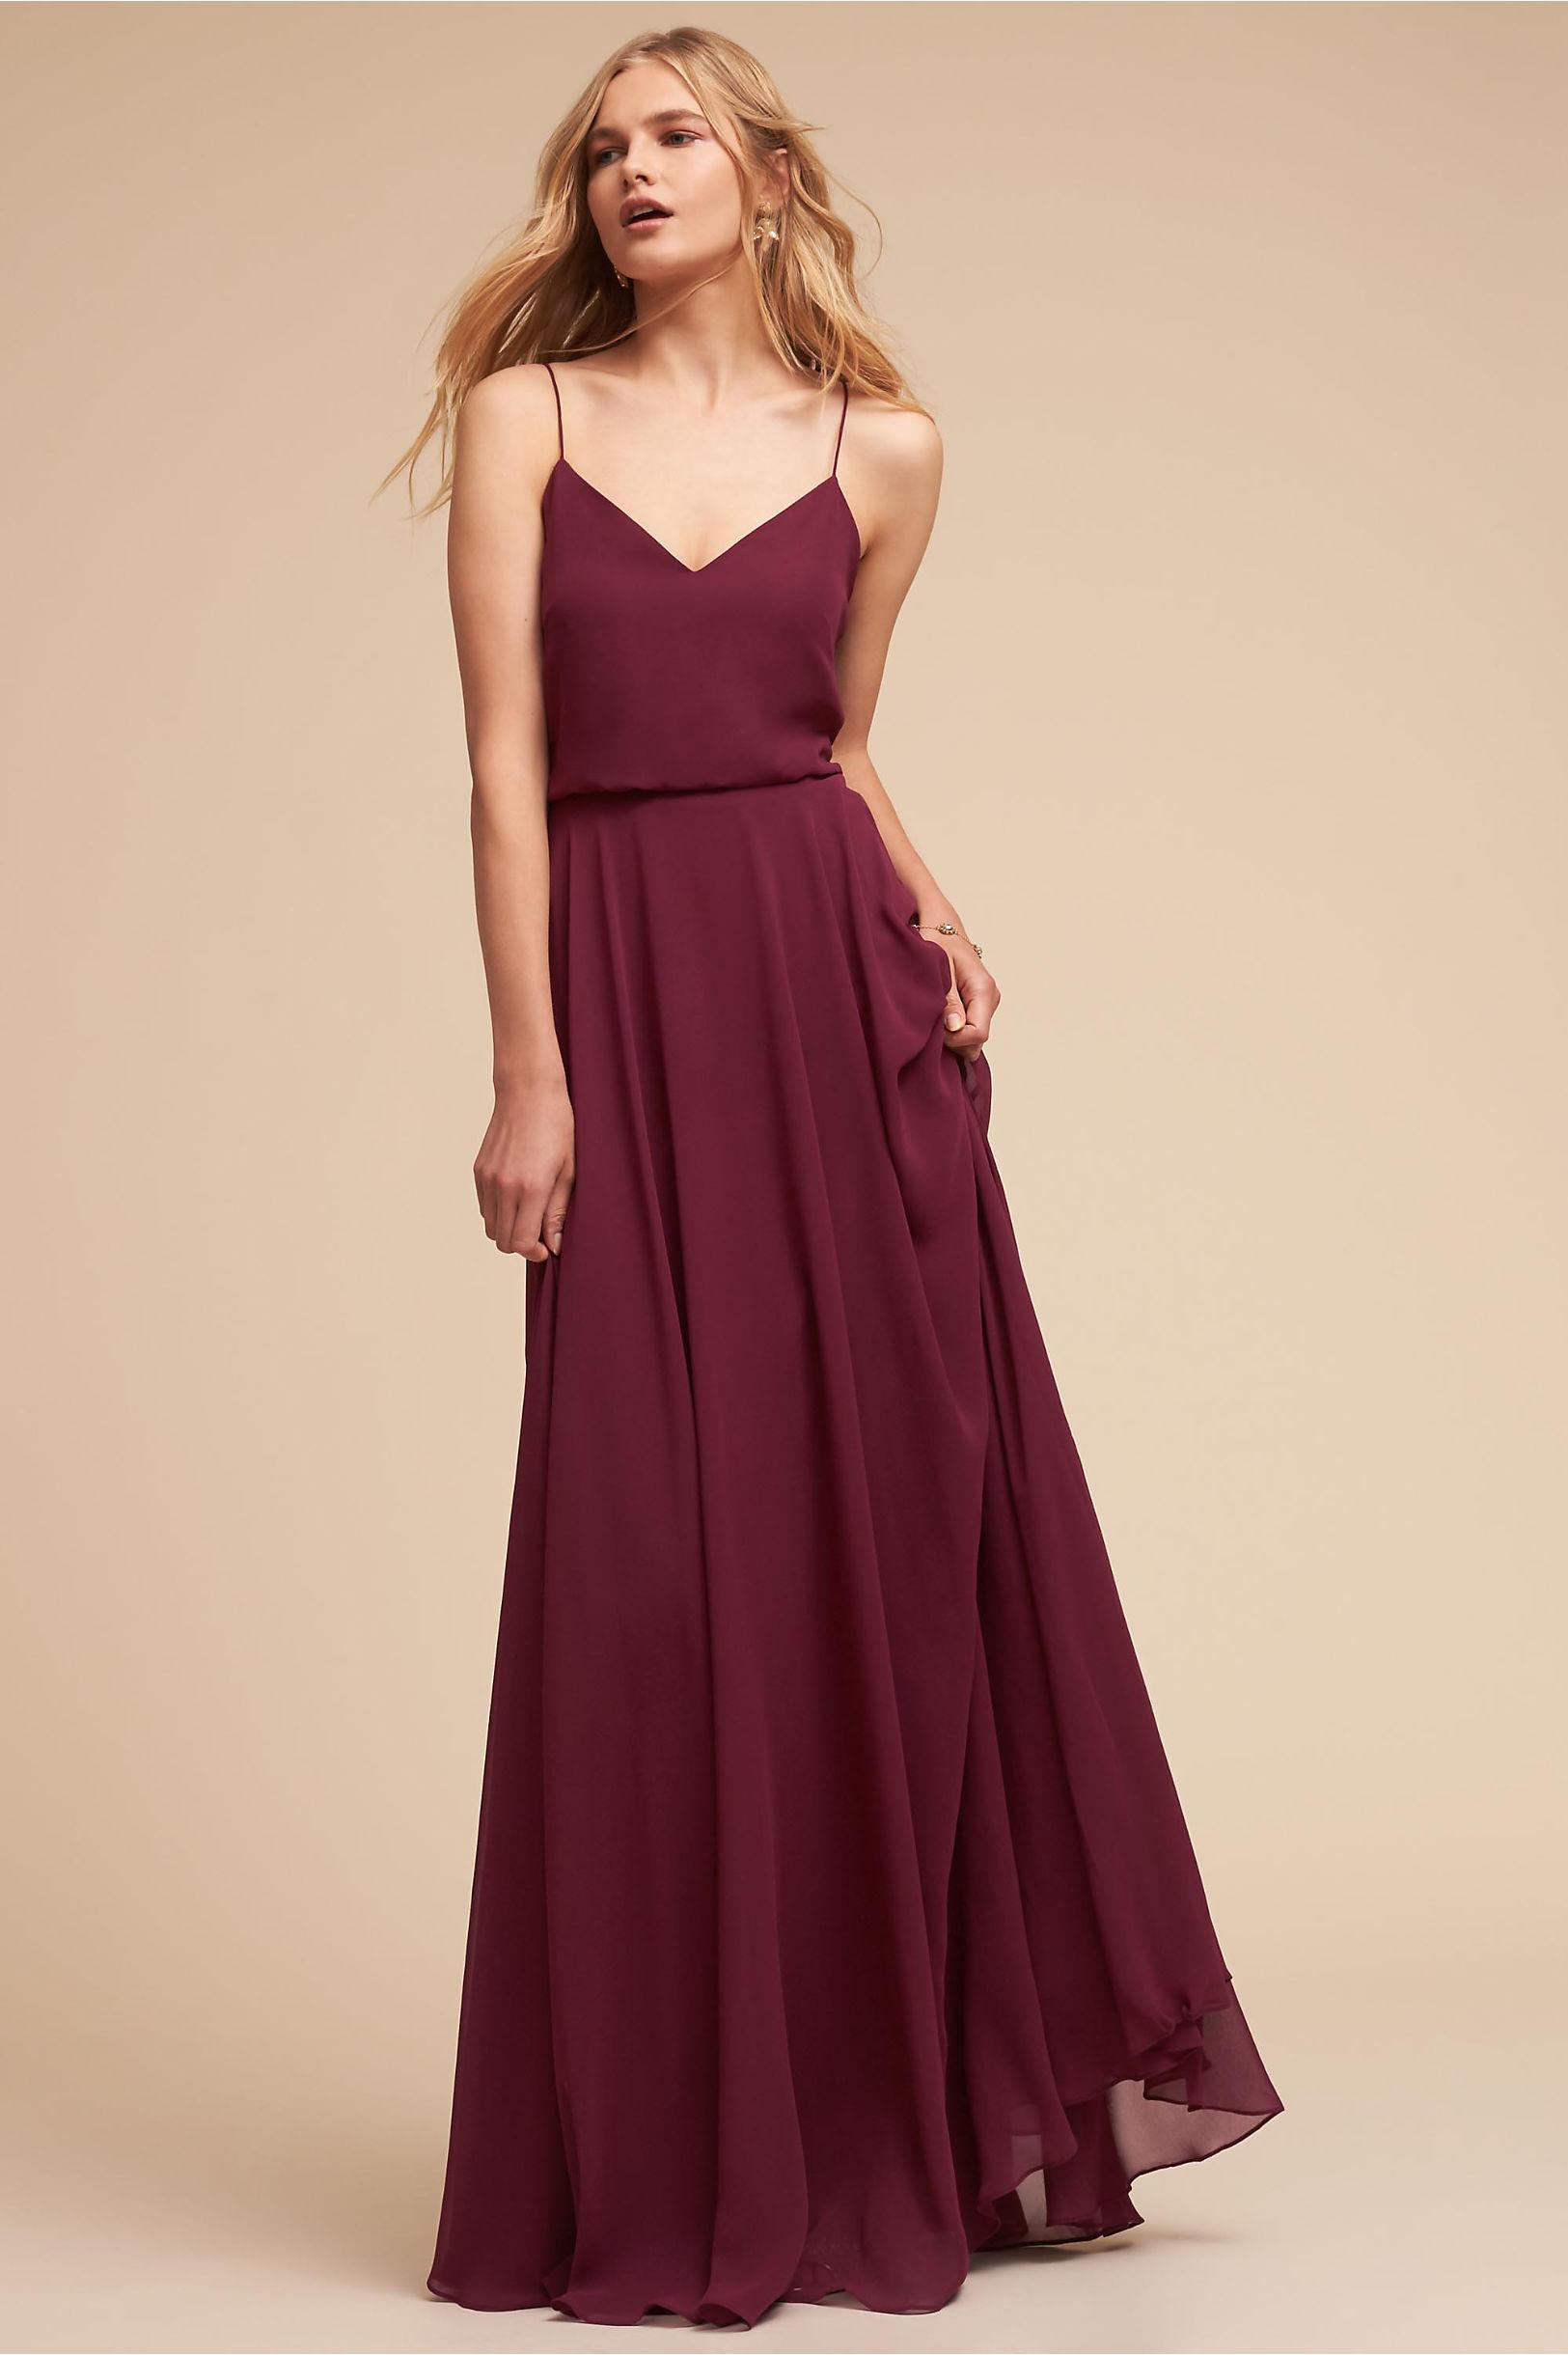 e2c42d1914f8 Jenny Yoo Black Cherry Inesse Dress | BHLDN